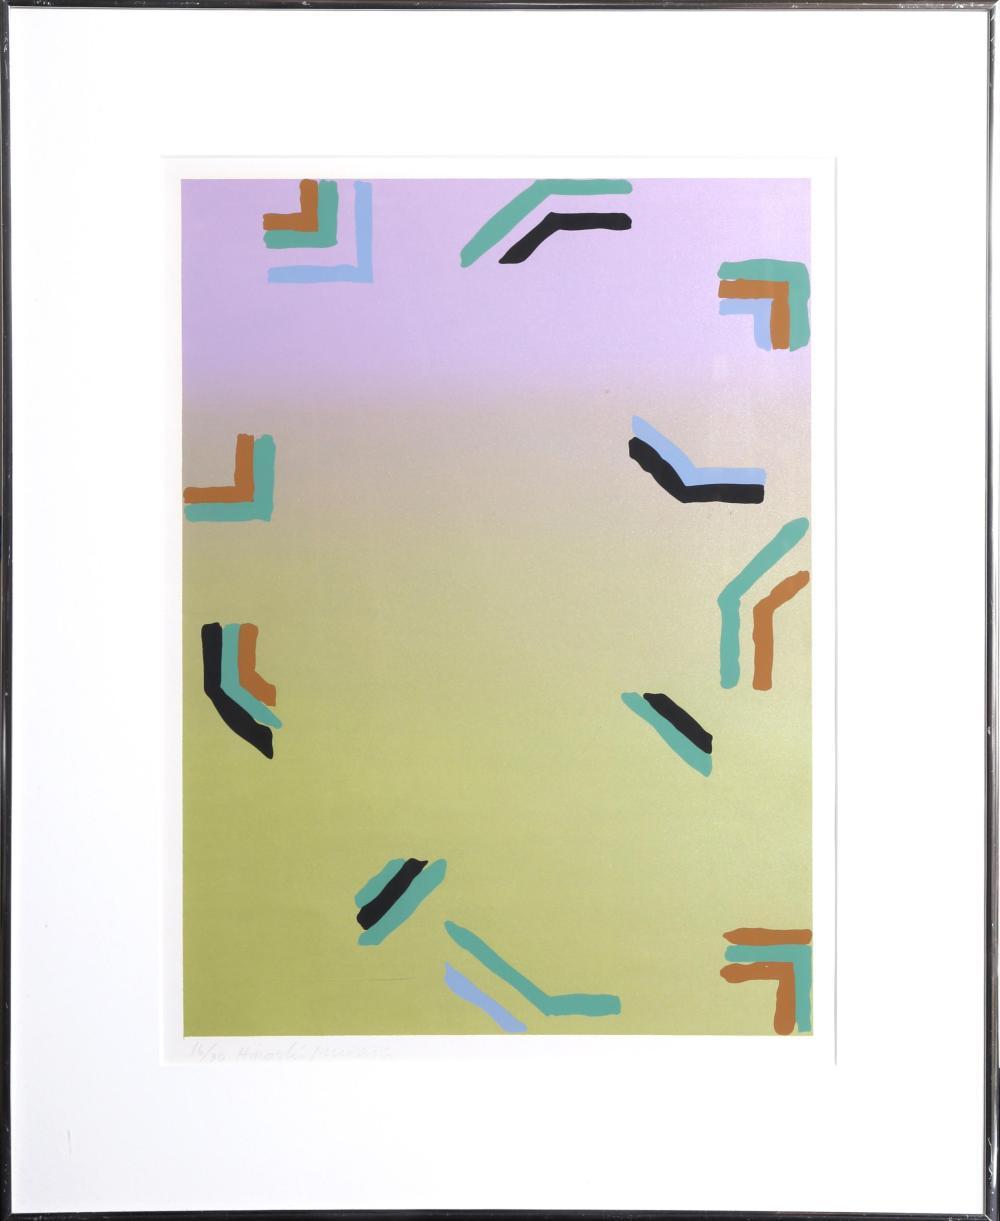 Hiroshi Murata, Abstract on Purple to Green Ombre, Screenprint